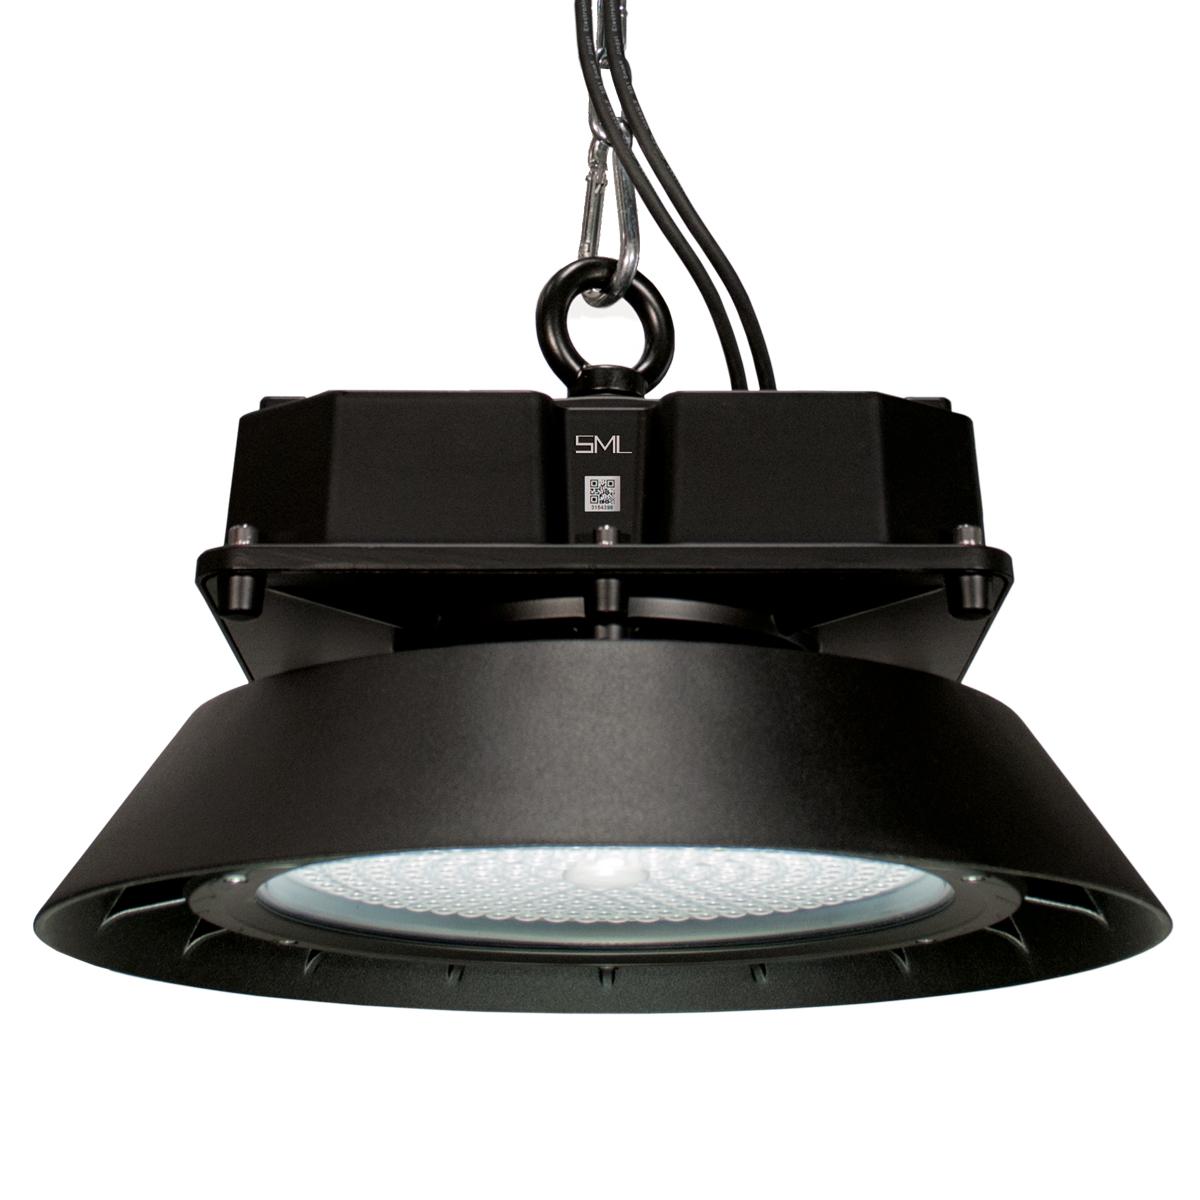 LED Hallenleuchte Koloss mit DALI